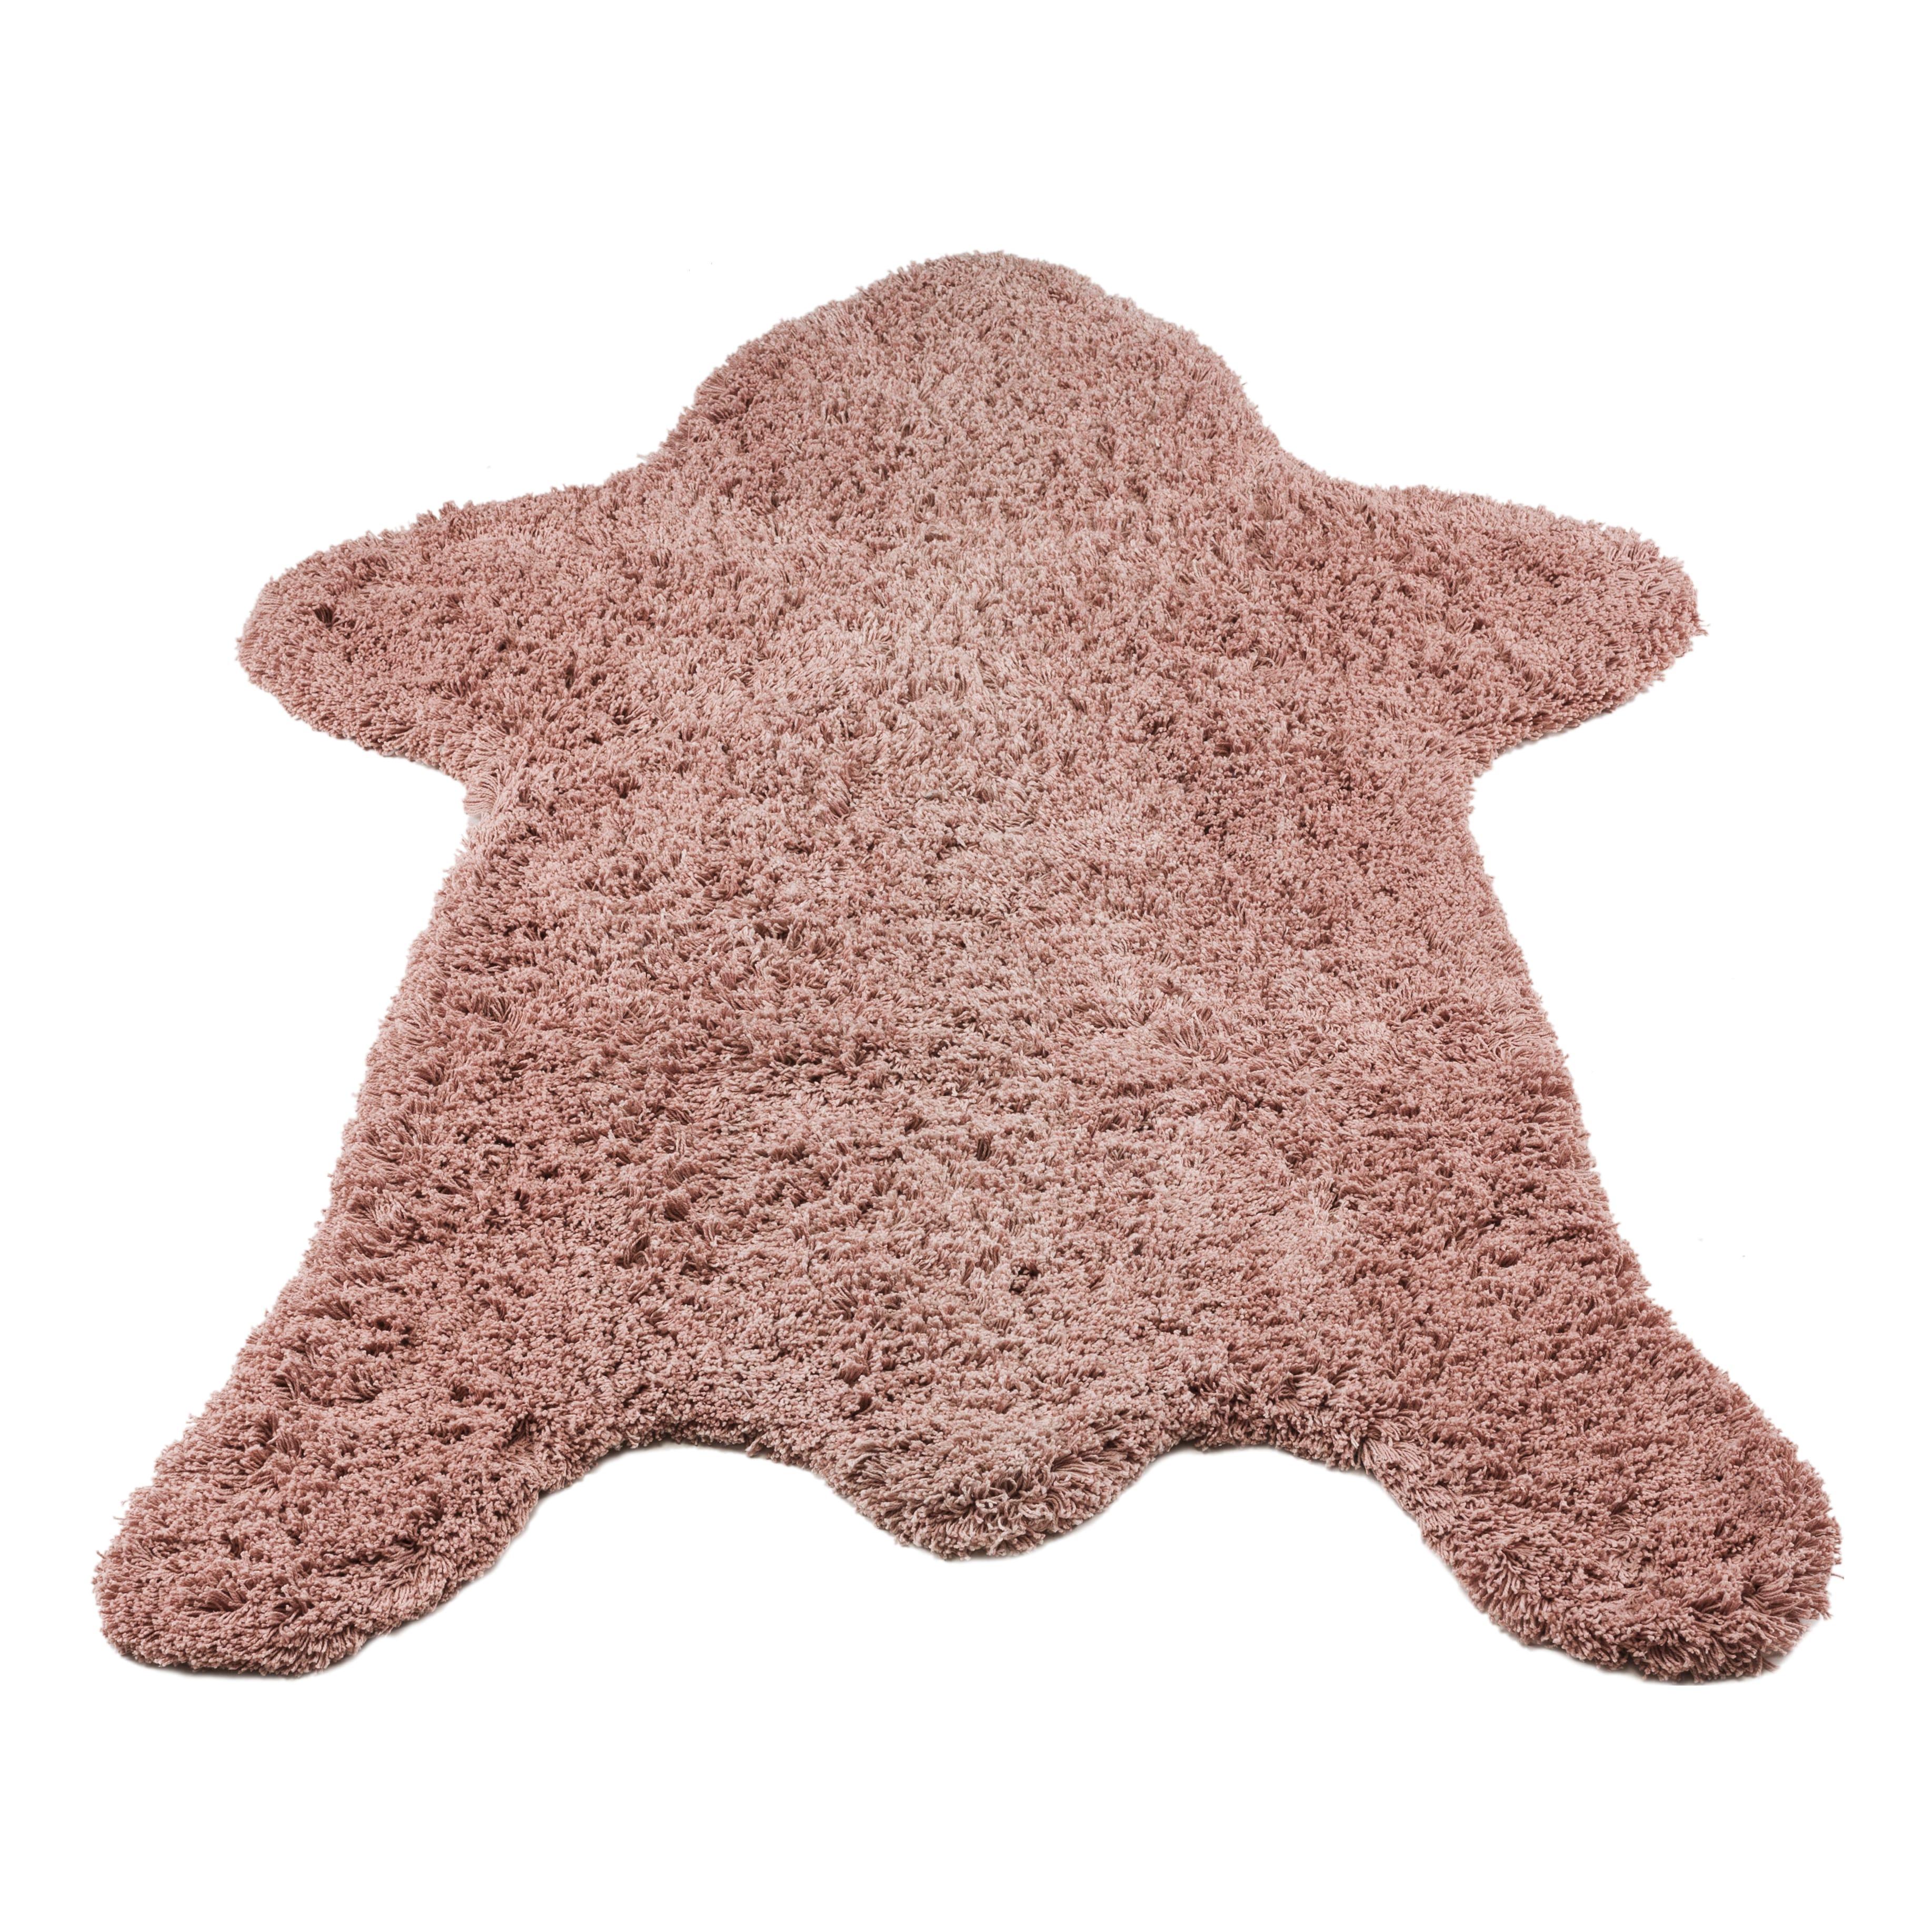 Image of Bear Kleed KidsDepot Pink 25343